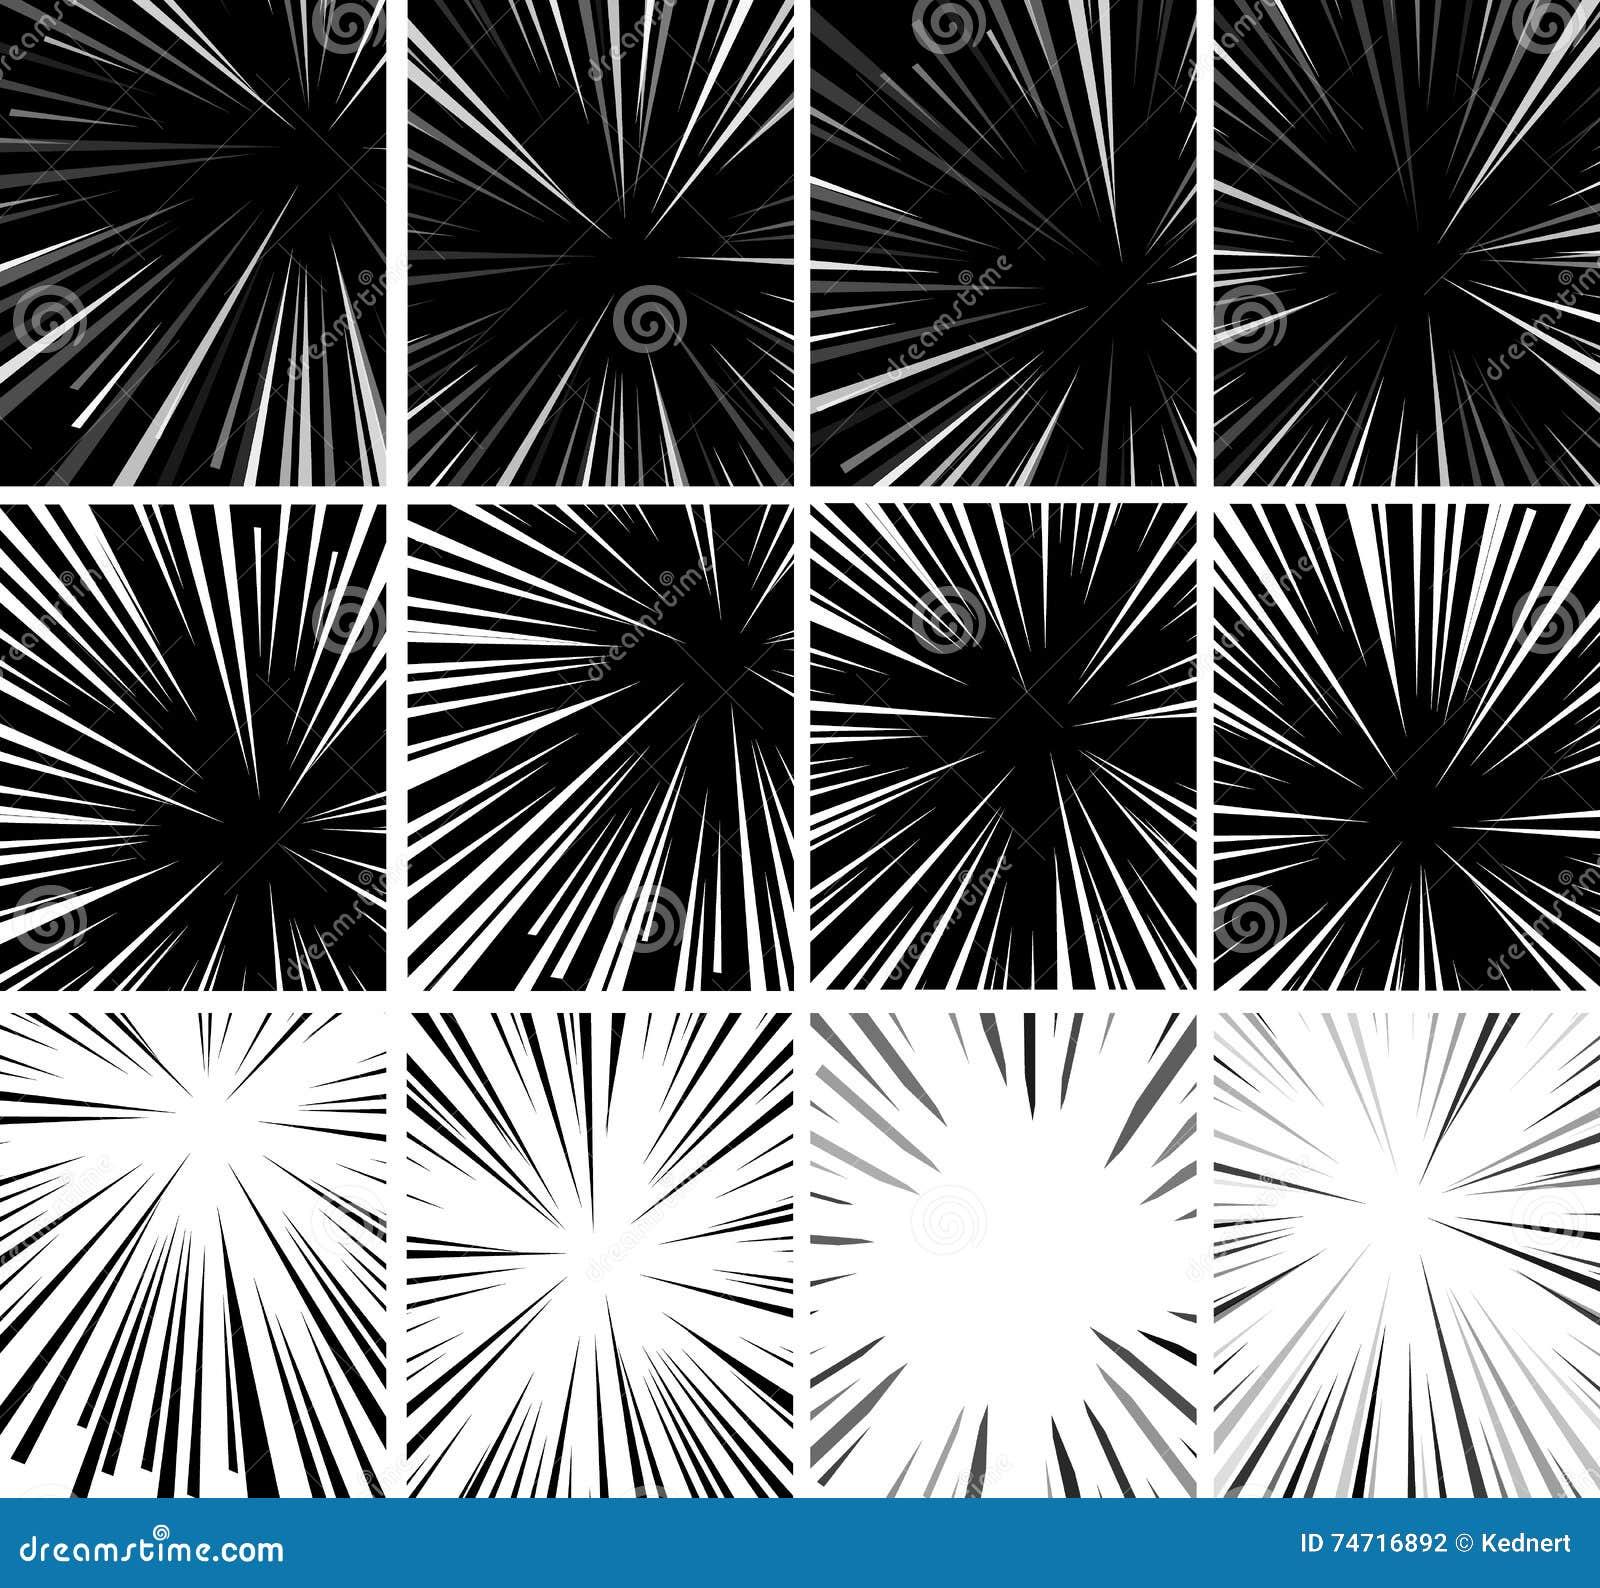 Comic book superhero pop art style black and white radial lines background manga or anime